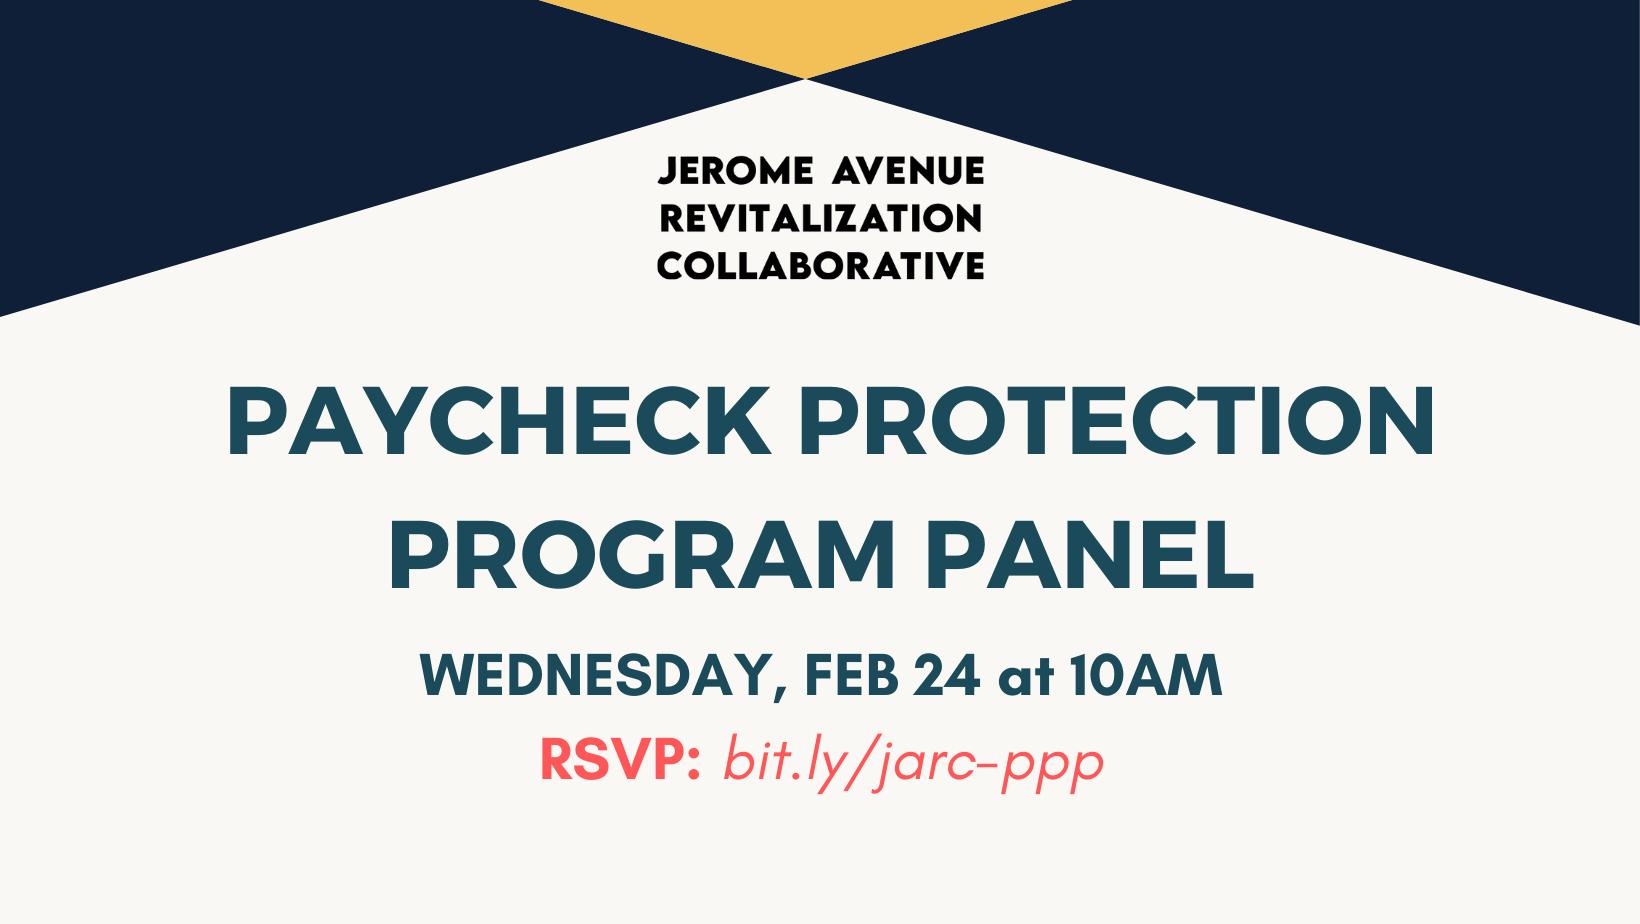 JARC PPP Panel Flyer – Logo Above